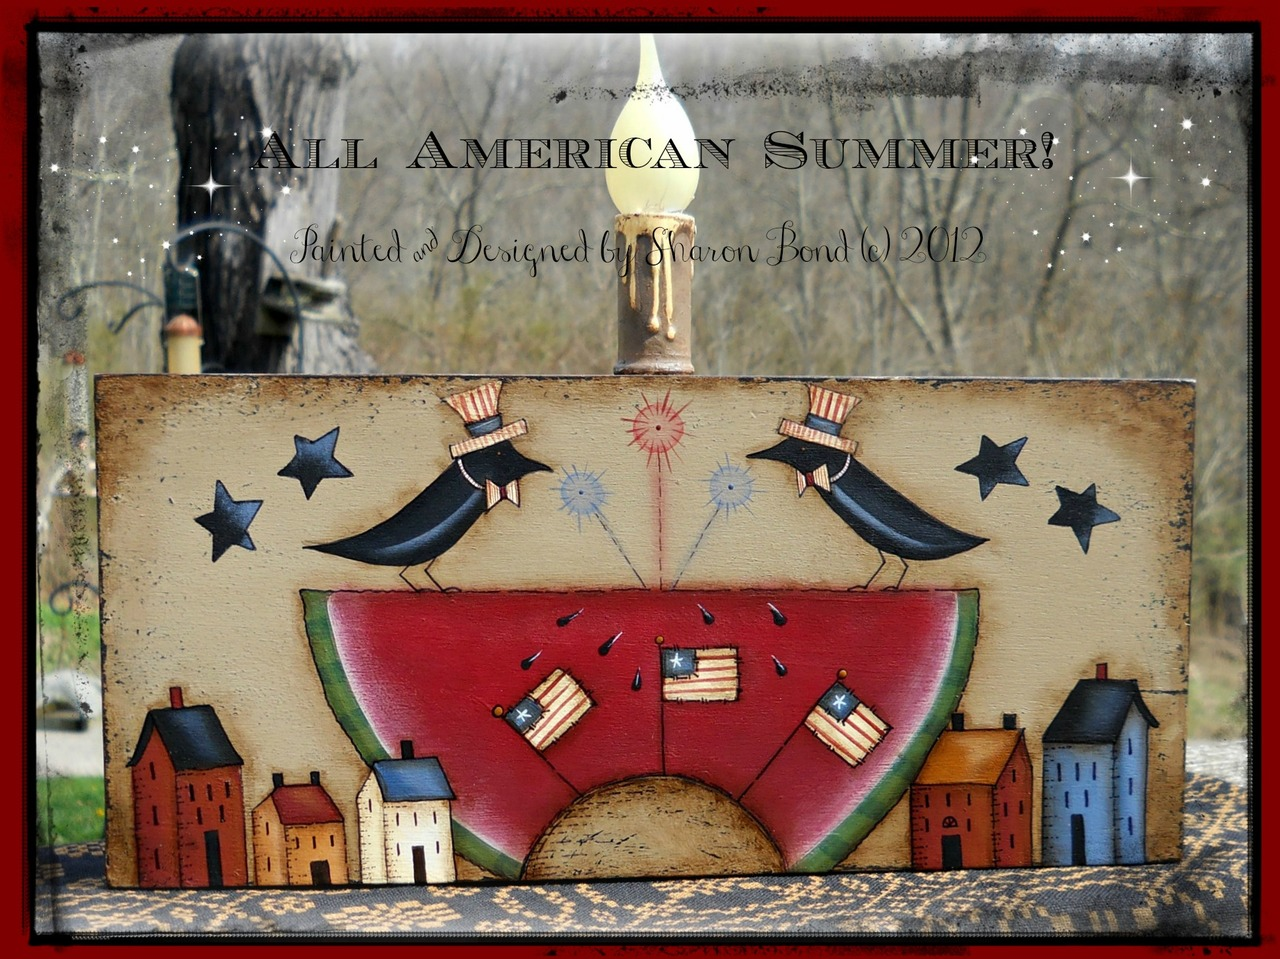 All American Summer - E-Packet - Sharon Bond